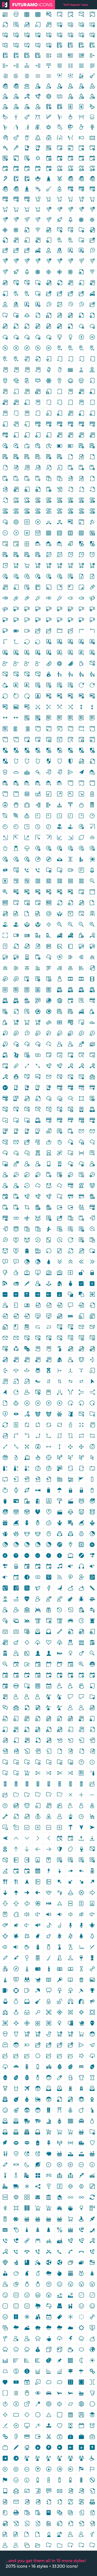 futuramo-icons-pro-soft-regular-style.png